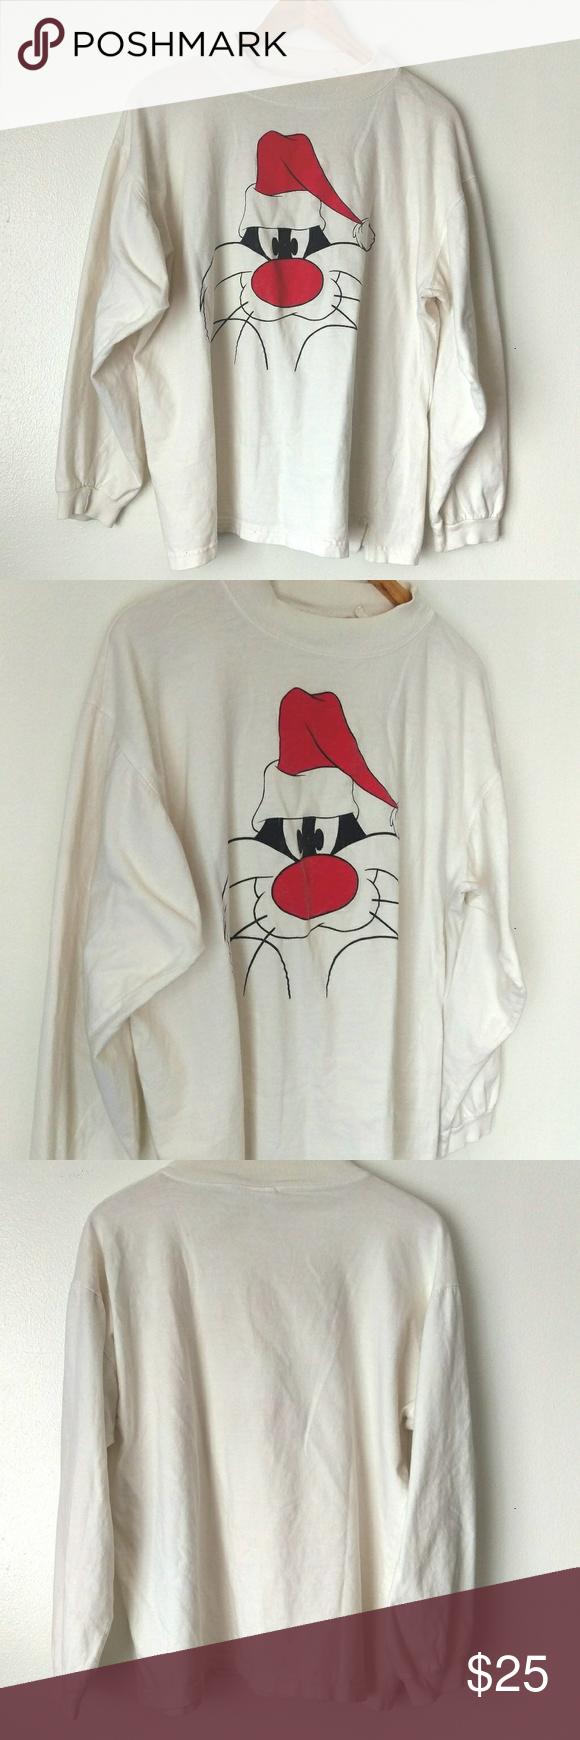 Acme clothing size L Acme clothing, Clothes, Long sleeve